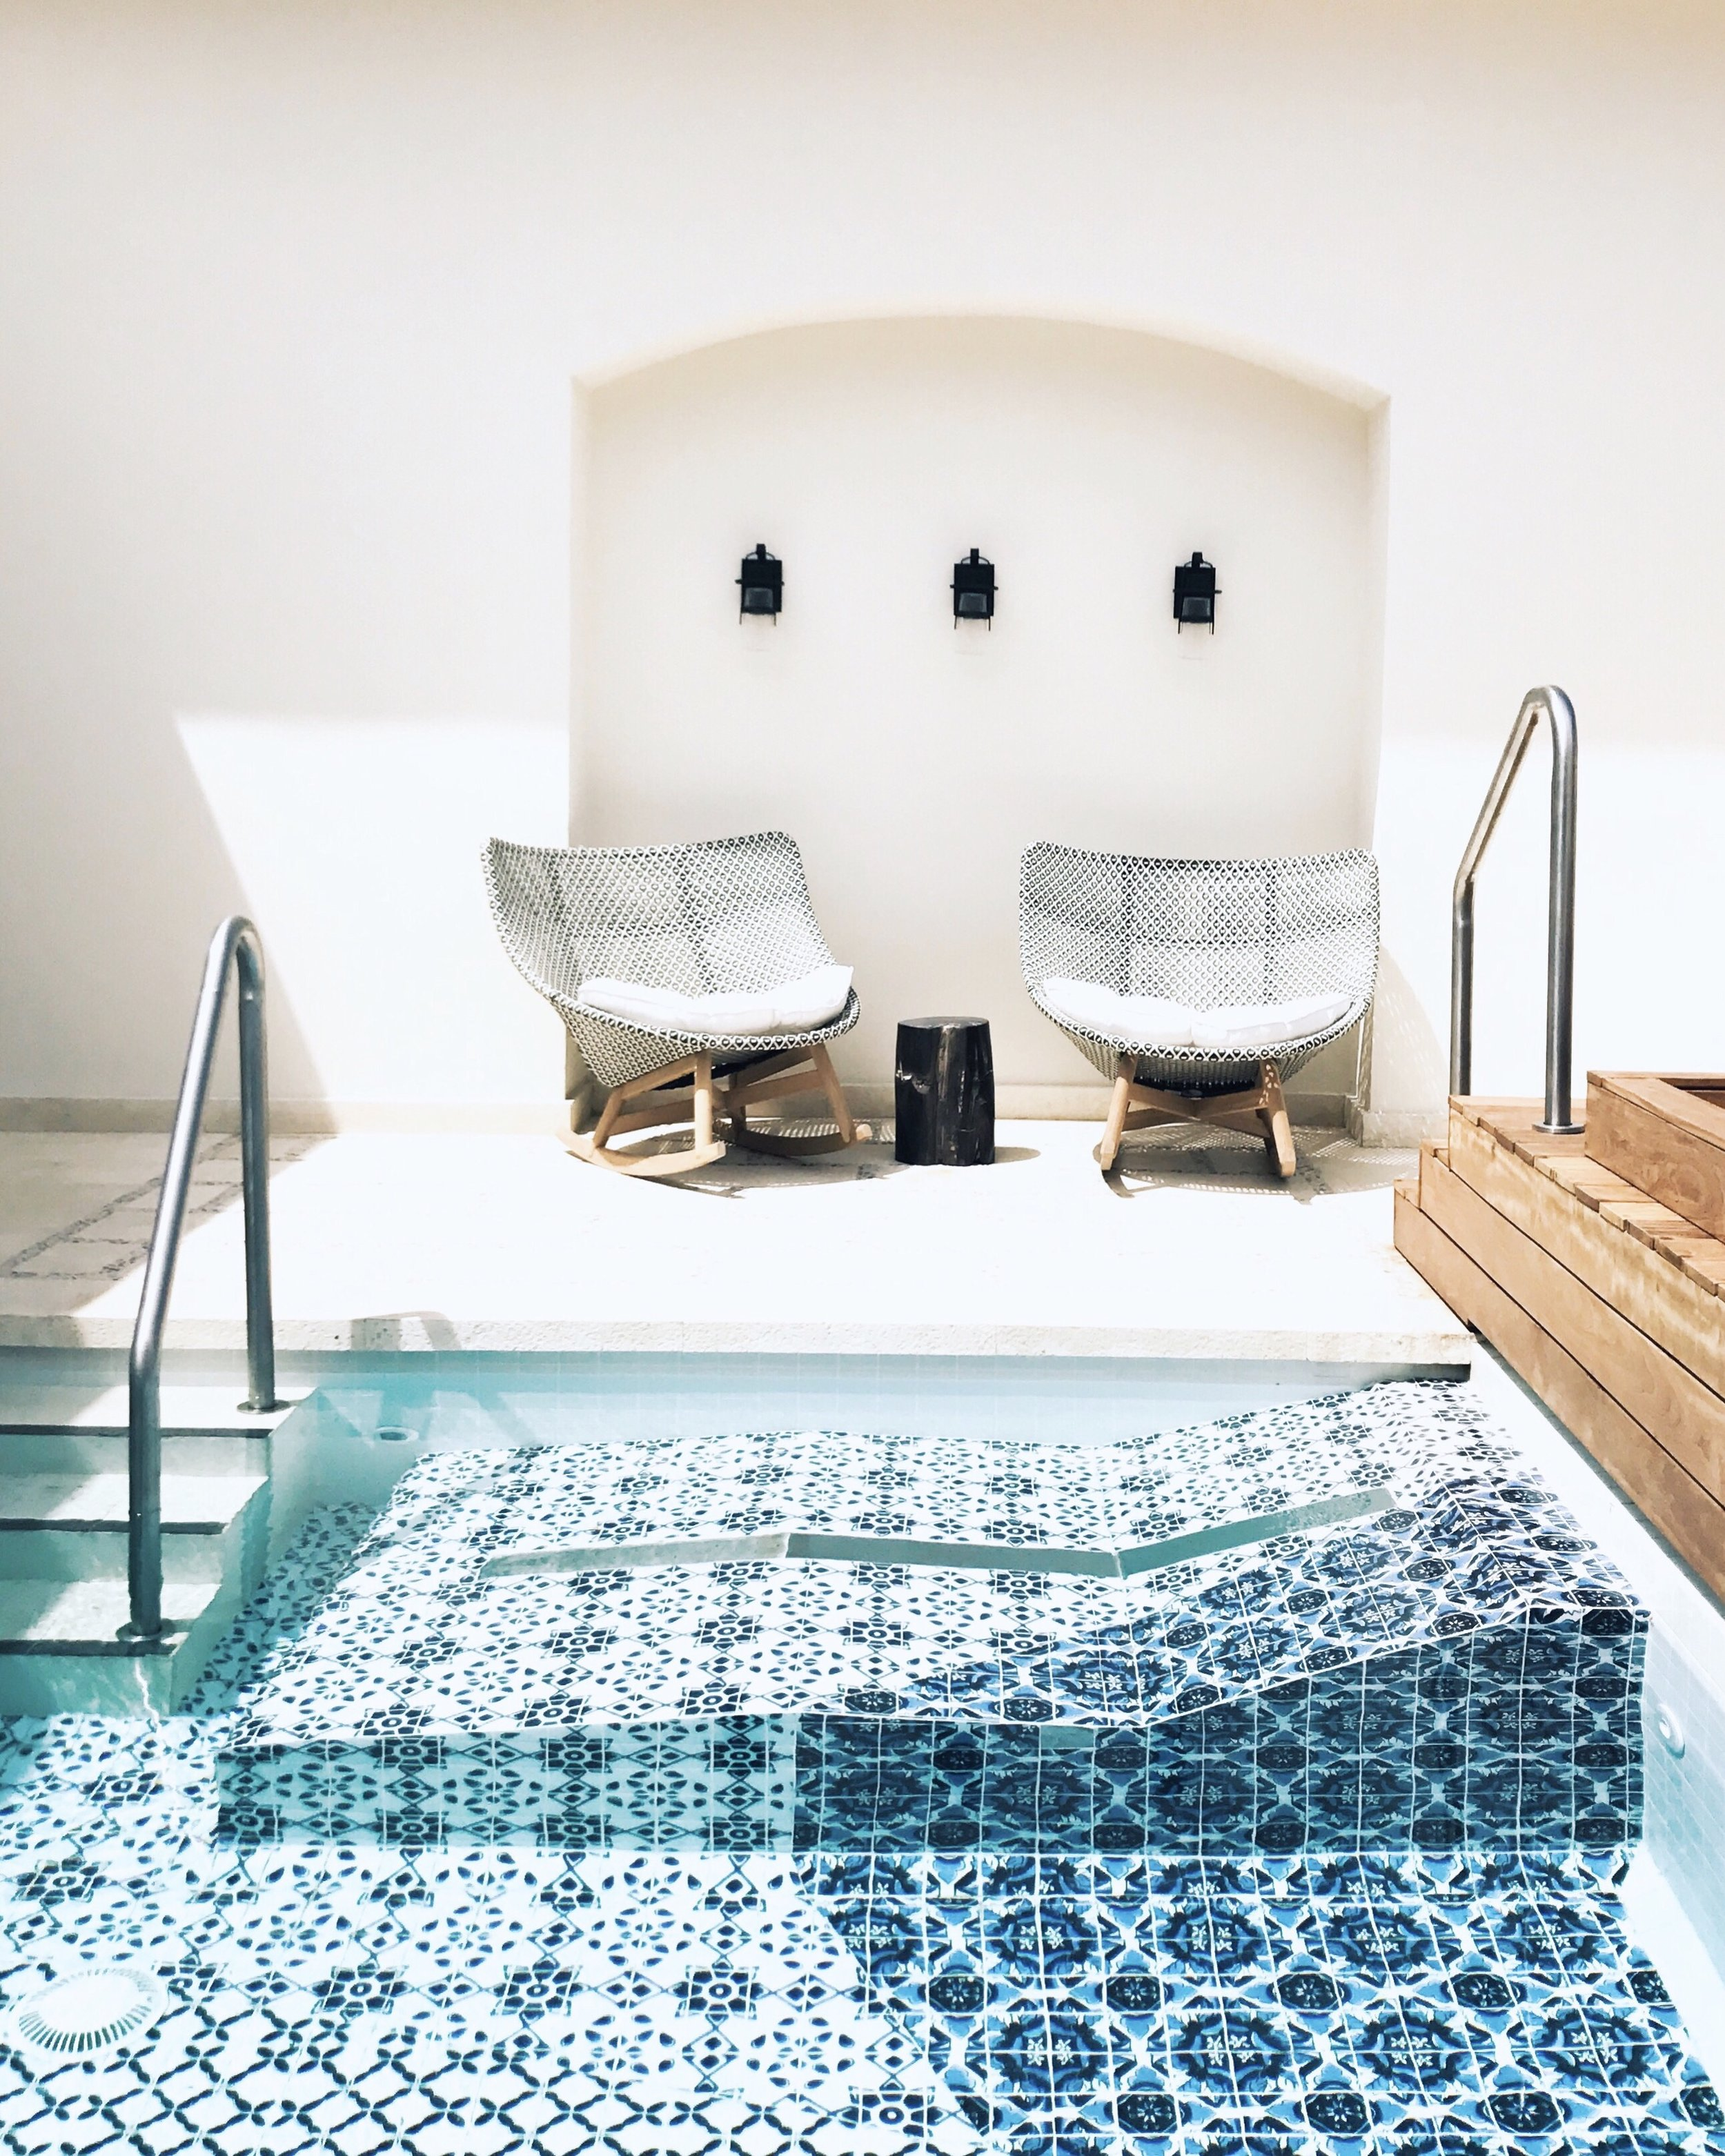 esther-ildiko-brown-esther-brown-interior-design-interior-designer.jpg